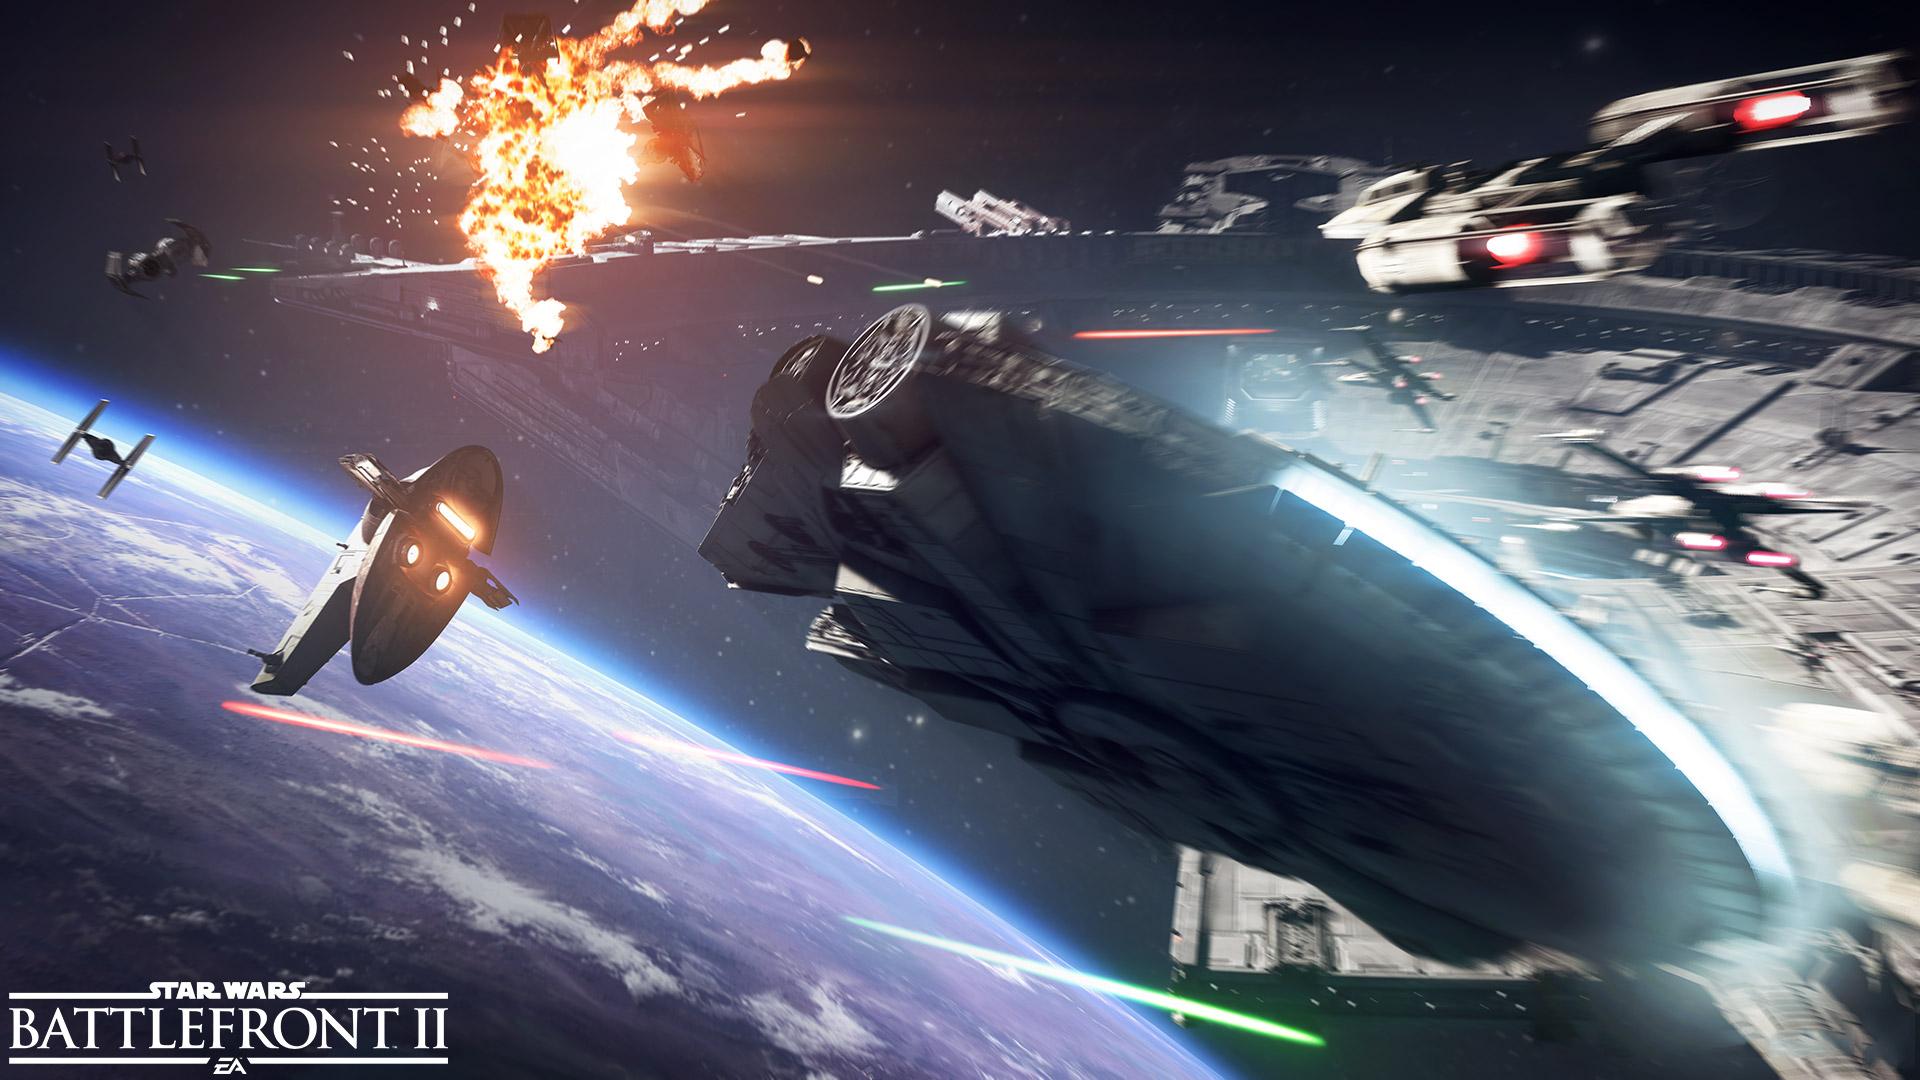 Star Wars Battlefront 2 background 4